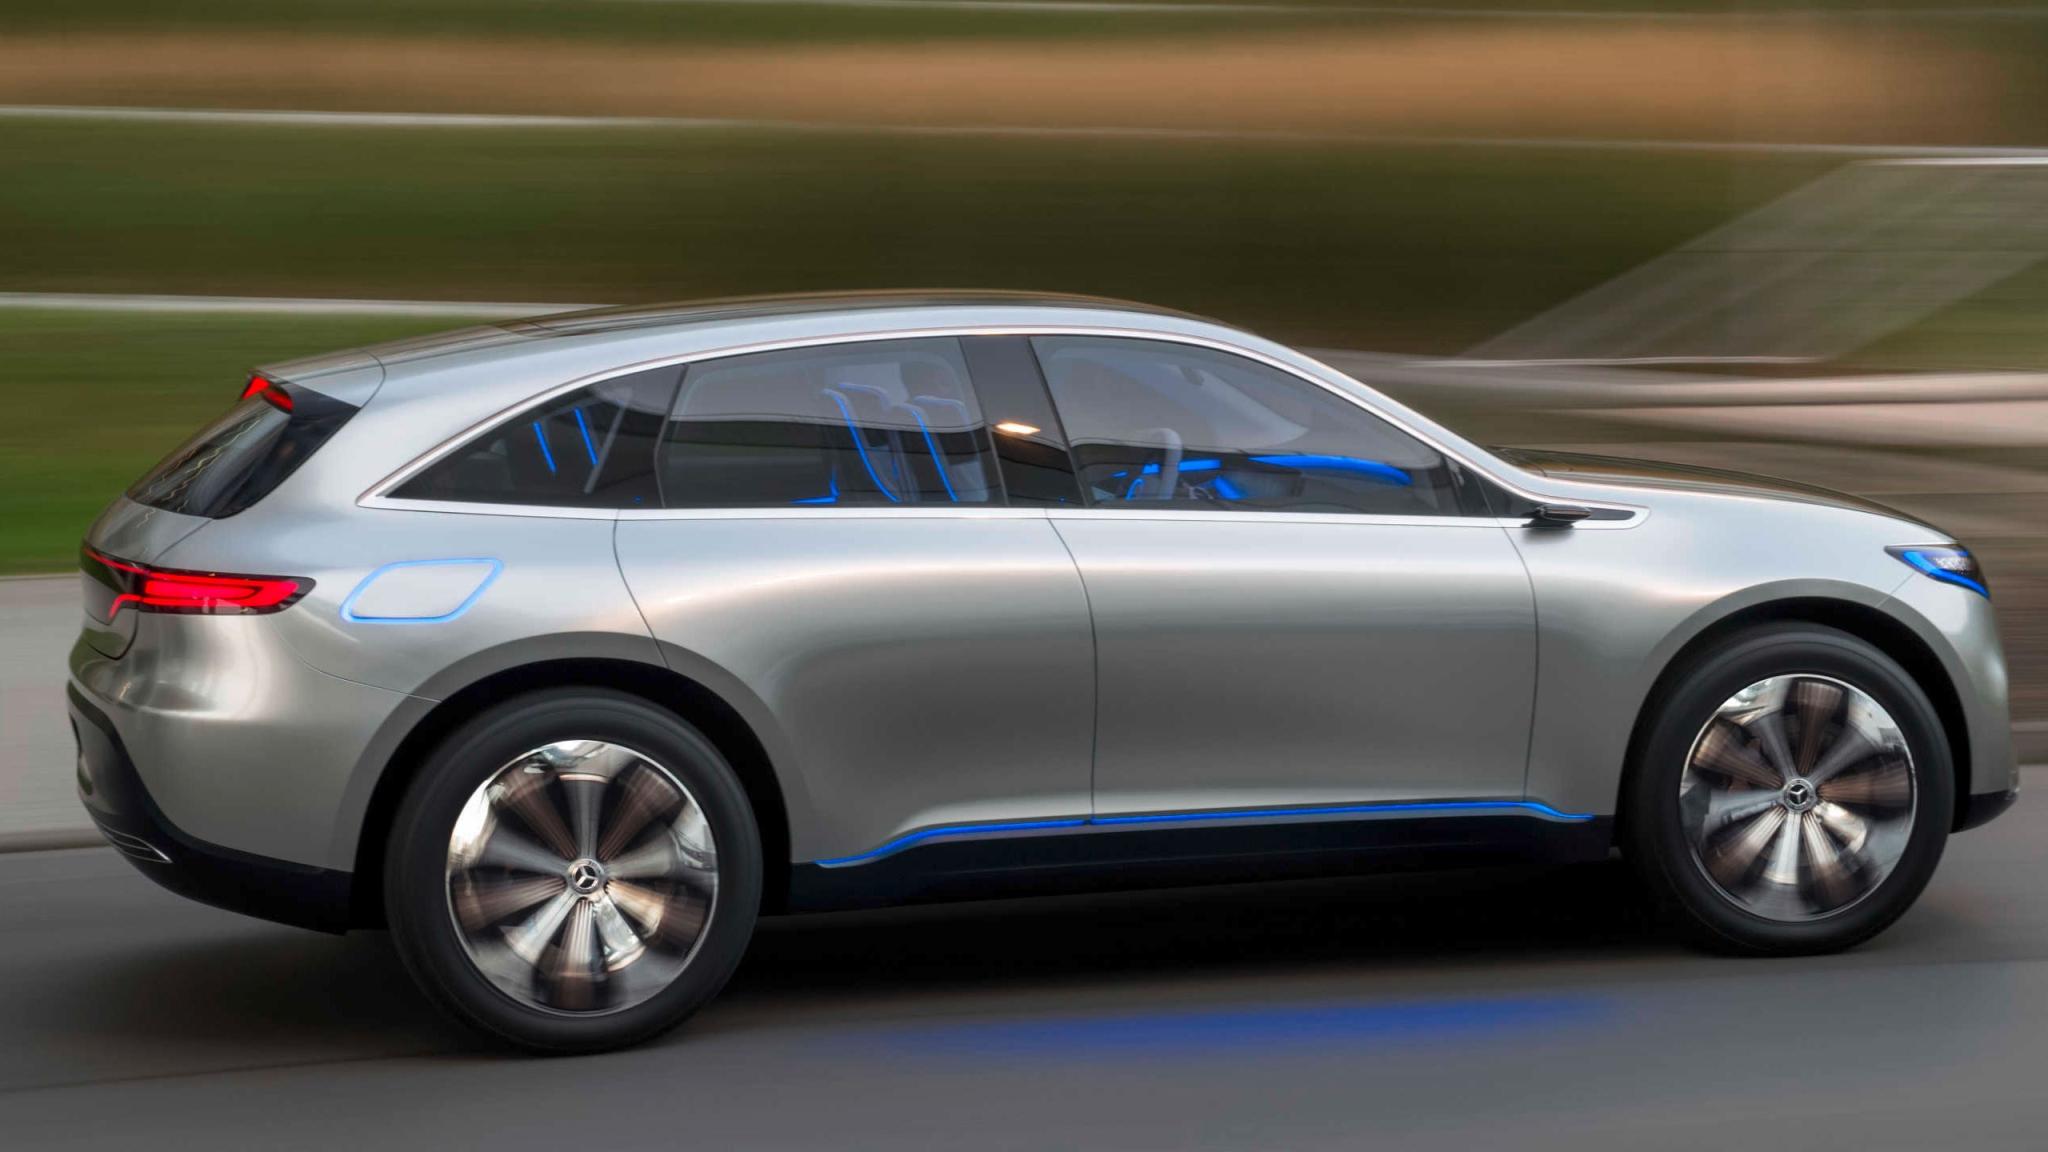 Mercedes benz concept eq electric mobility with luxury for Mercedes benz concept eq